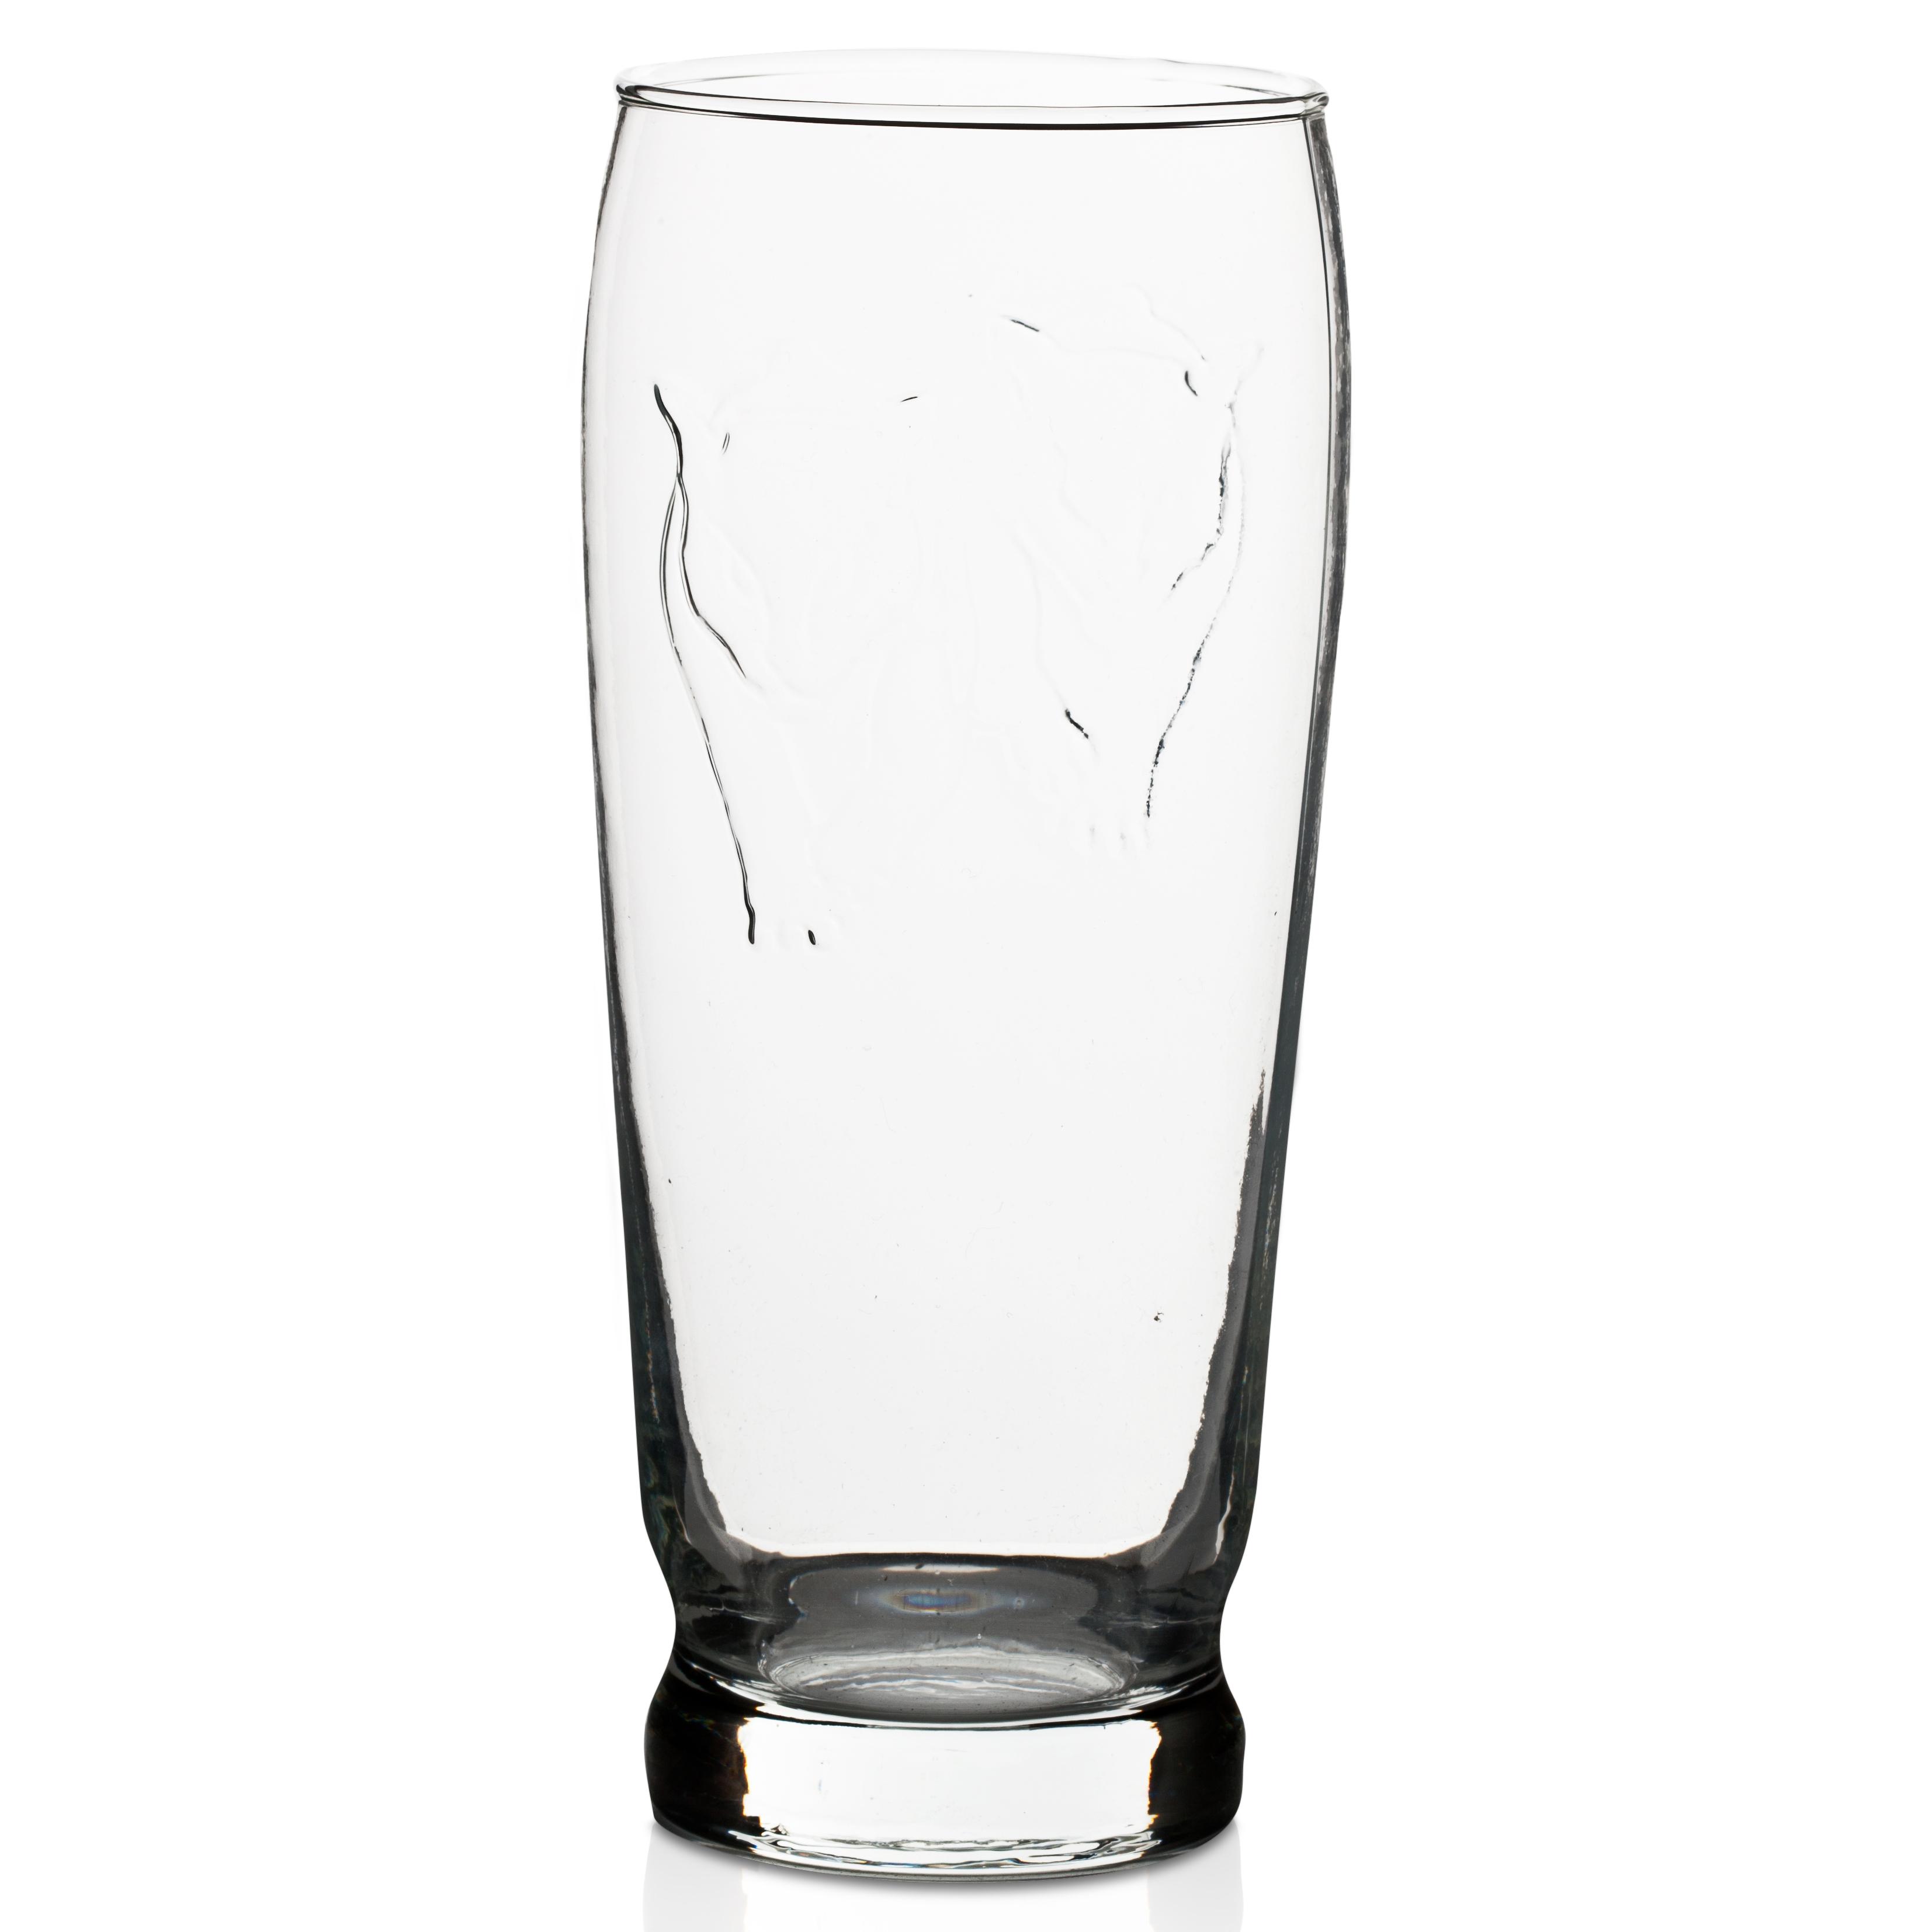 Sunderland Prestige Crest Pint Glass